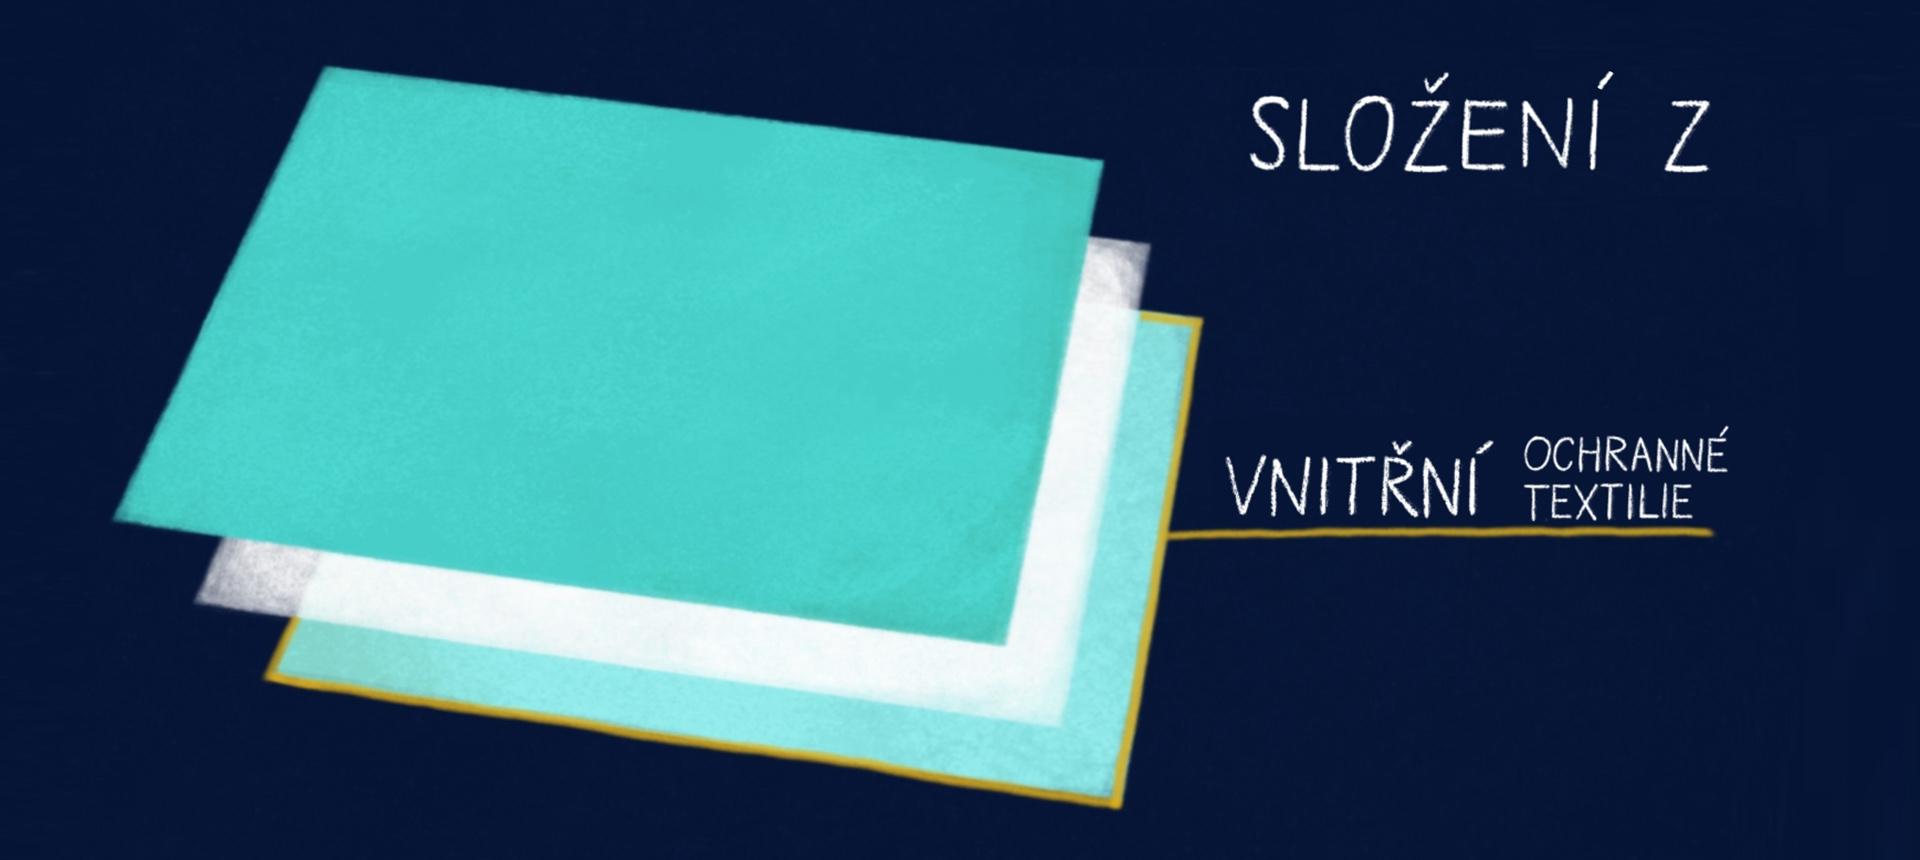 Složení z vnitřní ochranné textilie SPURTEX